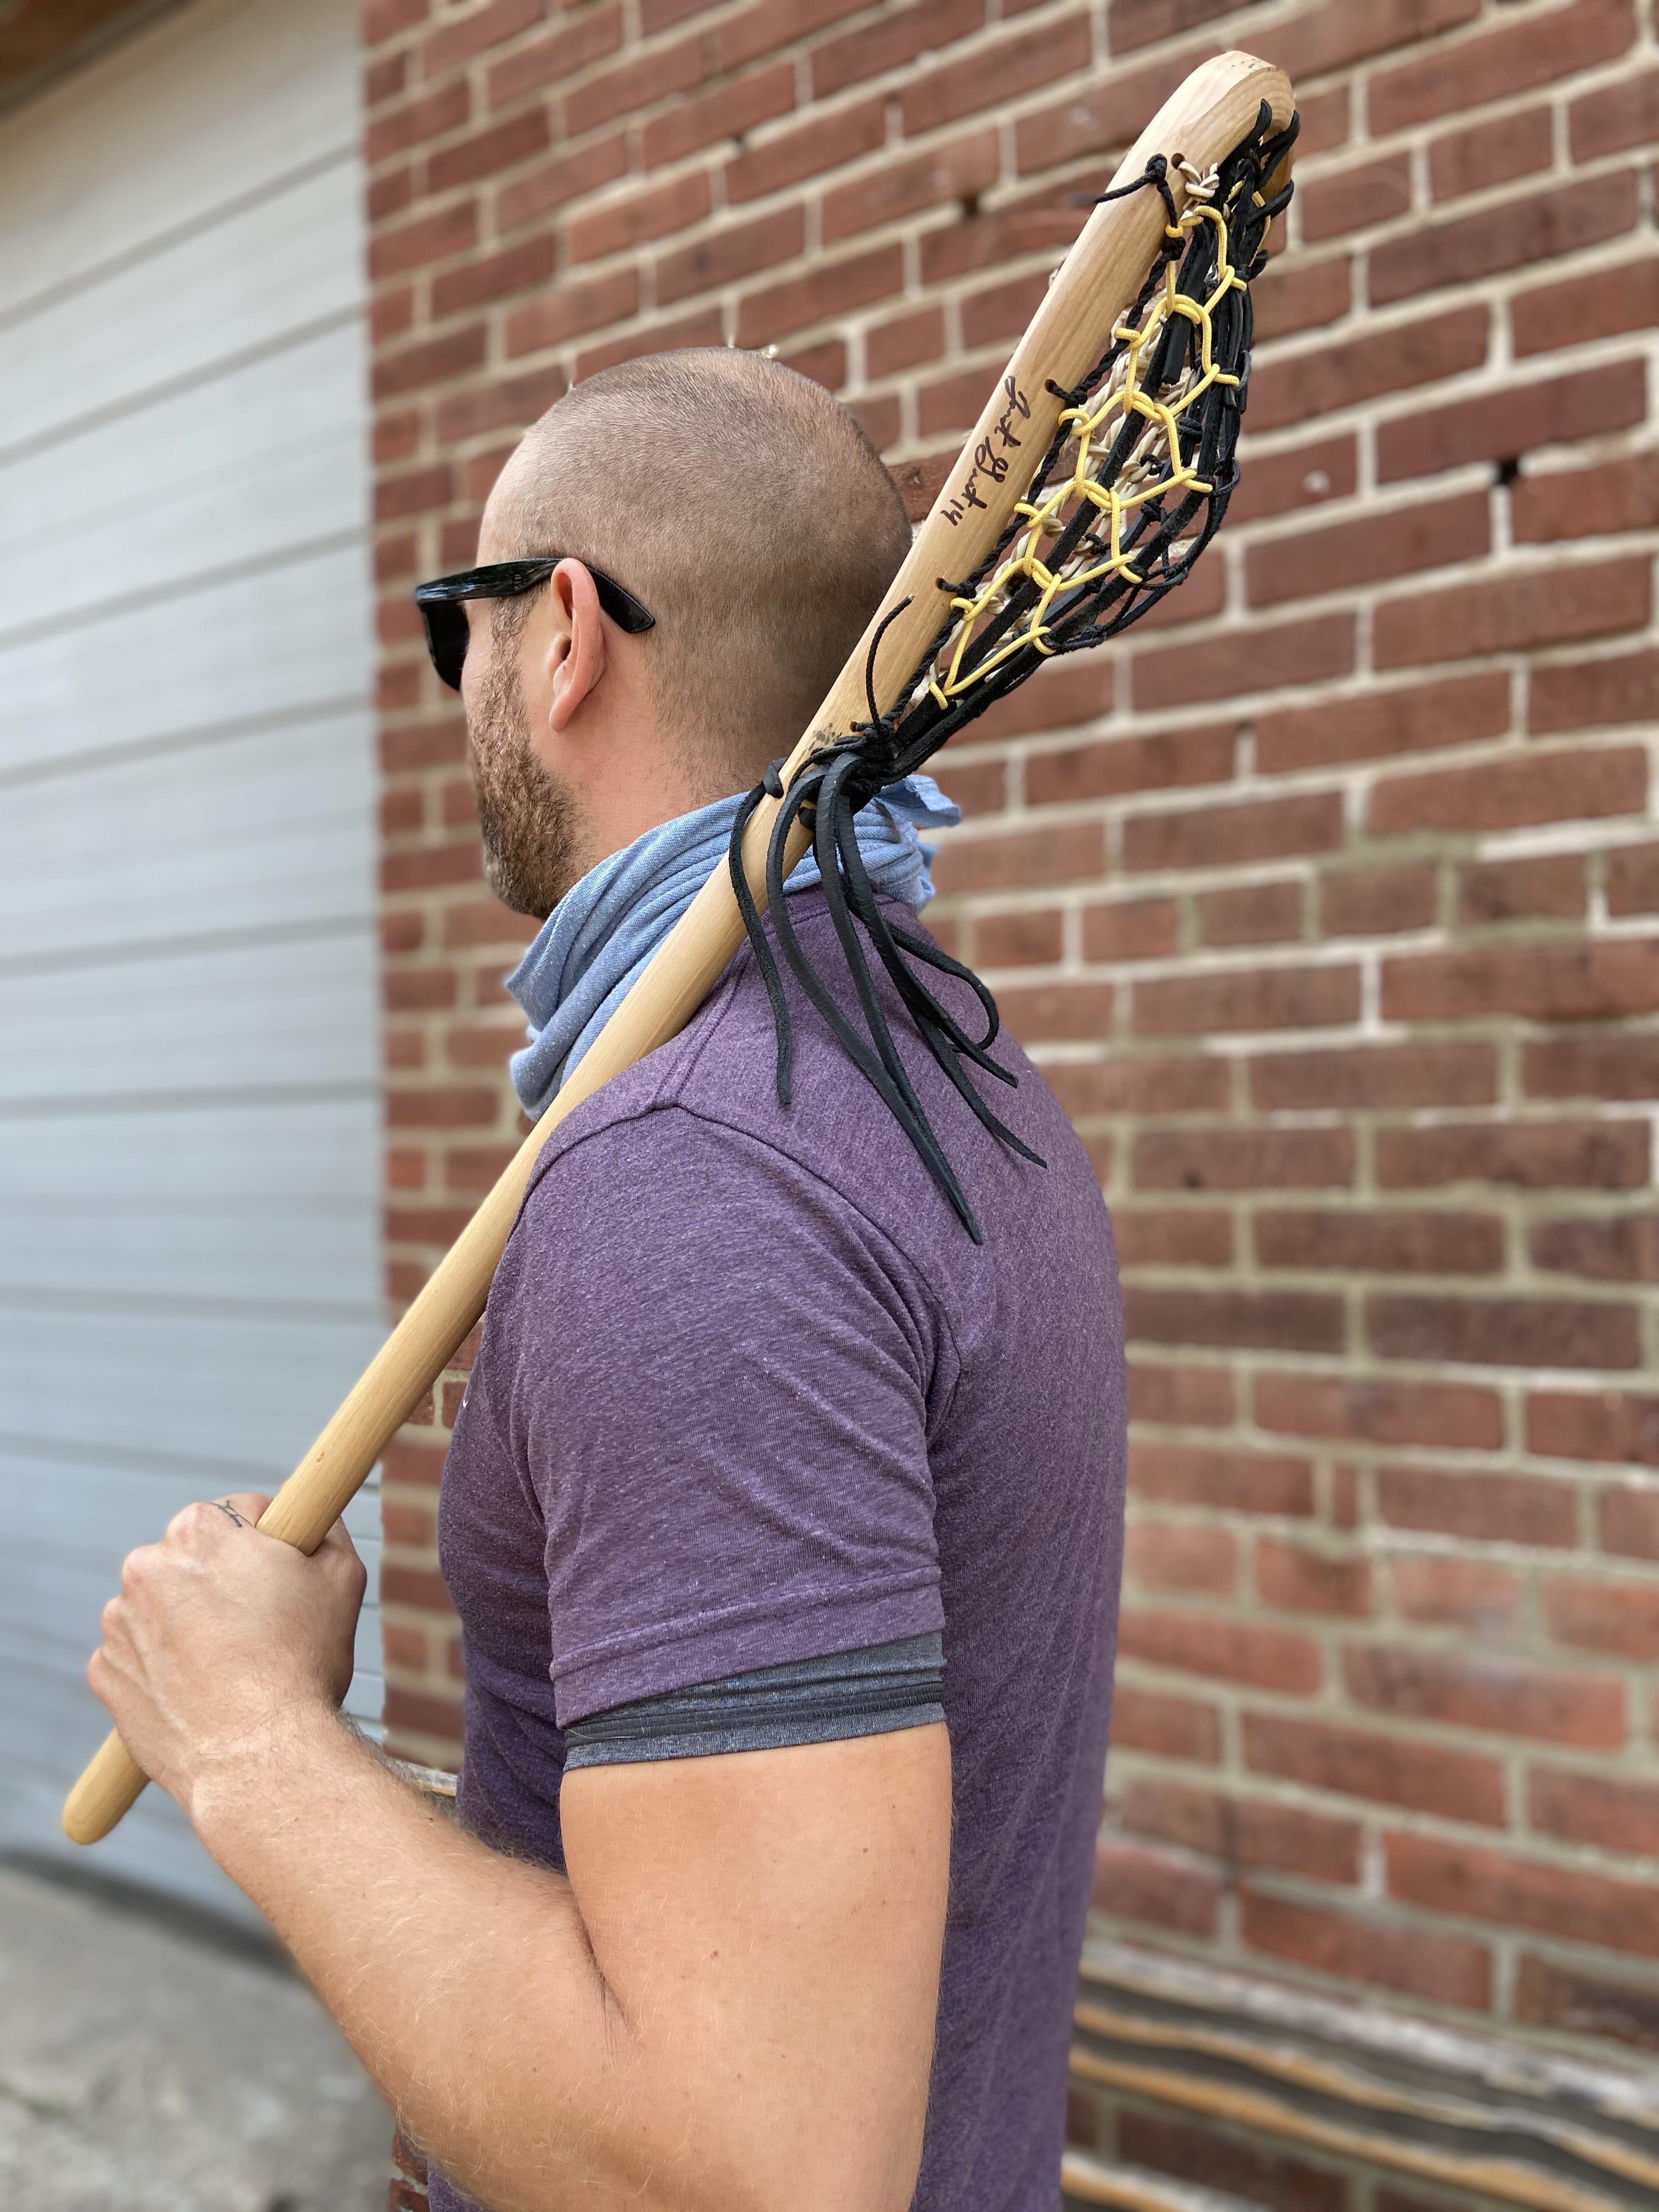 WIN a Justin Guterding HANDMADE Twig (1/1) Wood Lacrosse Sticks Exclusive